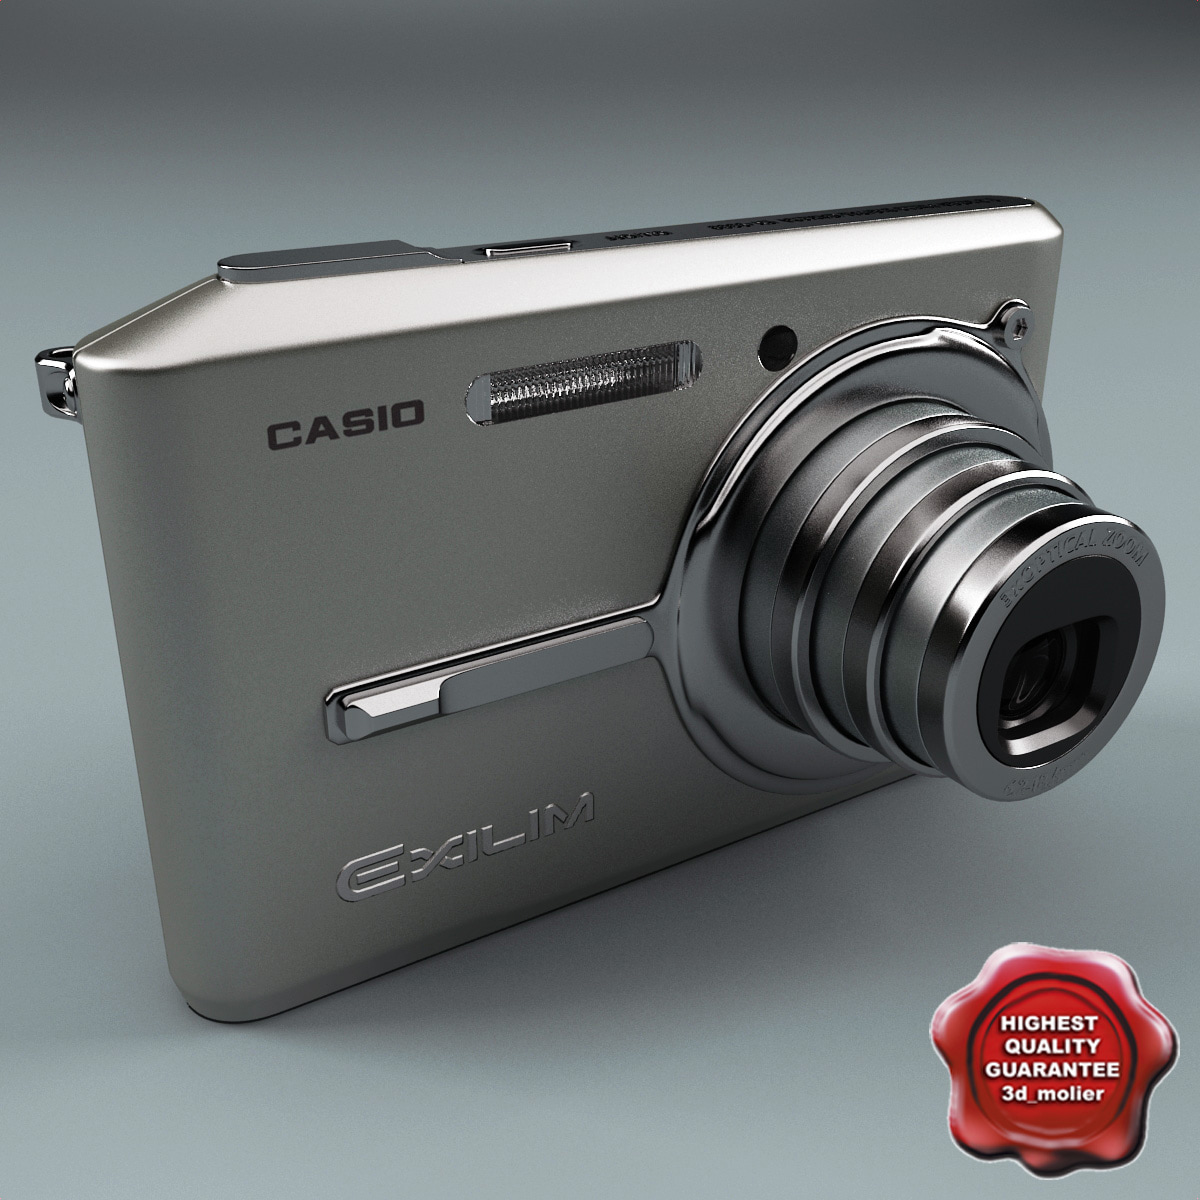 Digital_Camera_Casio_S600_00.jpg